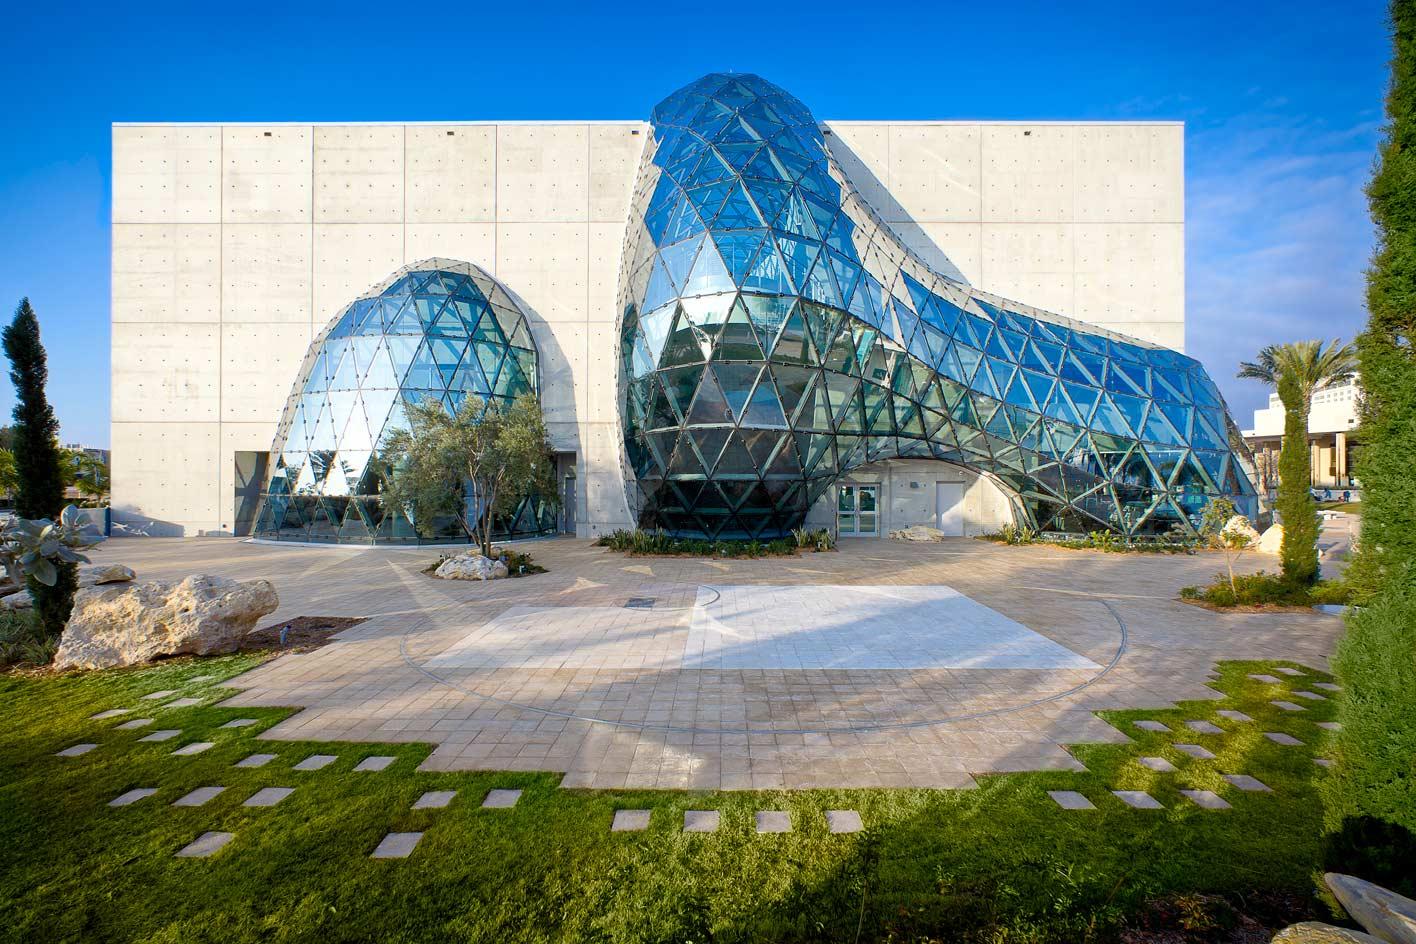 Das neue Salvador Dalí Museum in St. Petersburg